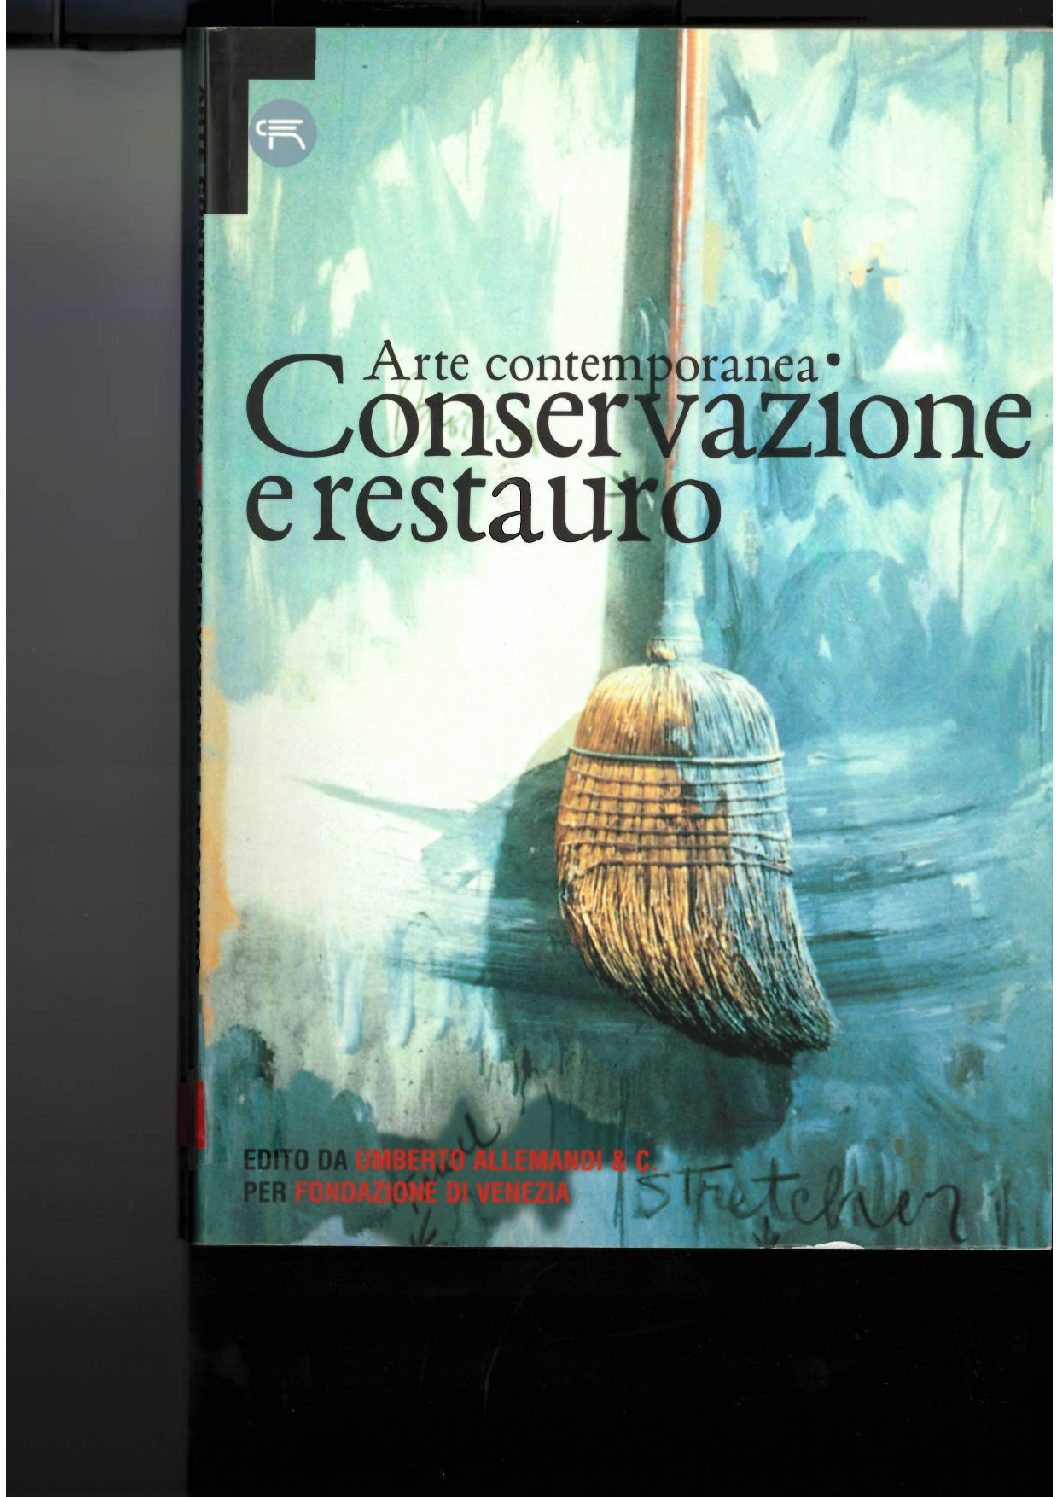 http://cbccoop.it/app/uploads/2017/09/COP-ARTE-CONTEMPORANEA-CONSERVAZIONE-E-RESTAURO-SILVESTRI-pdf.jpg